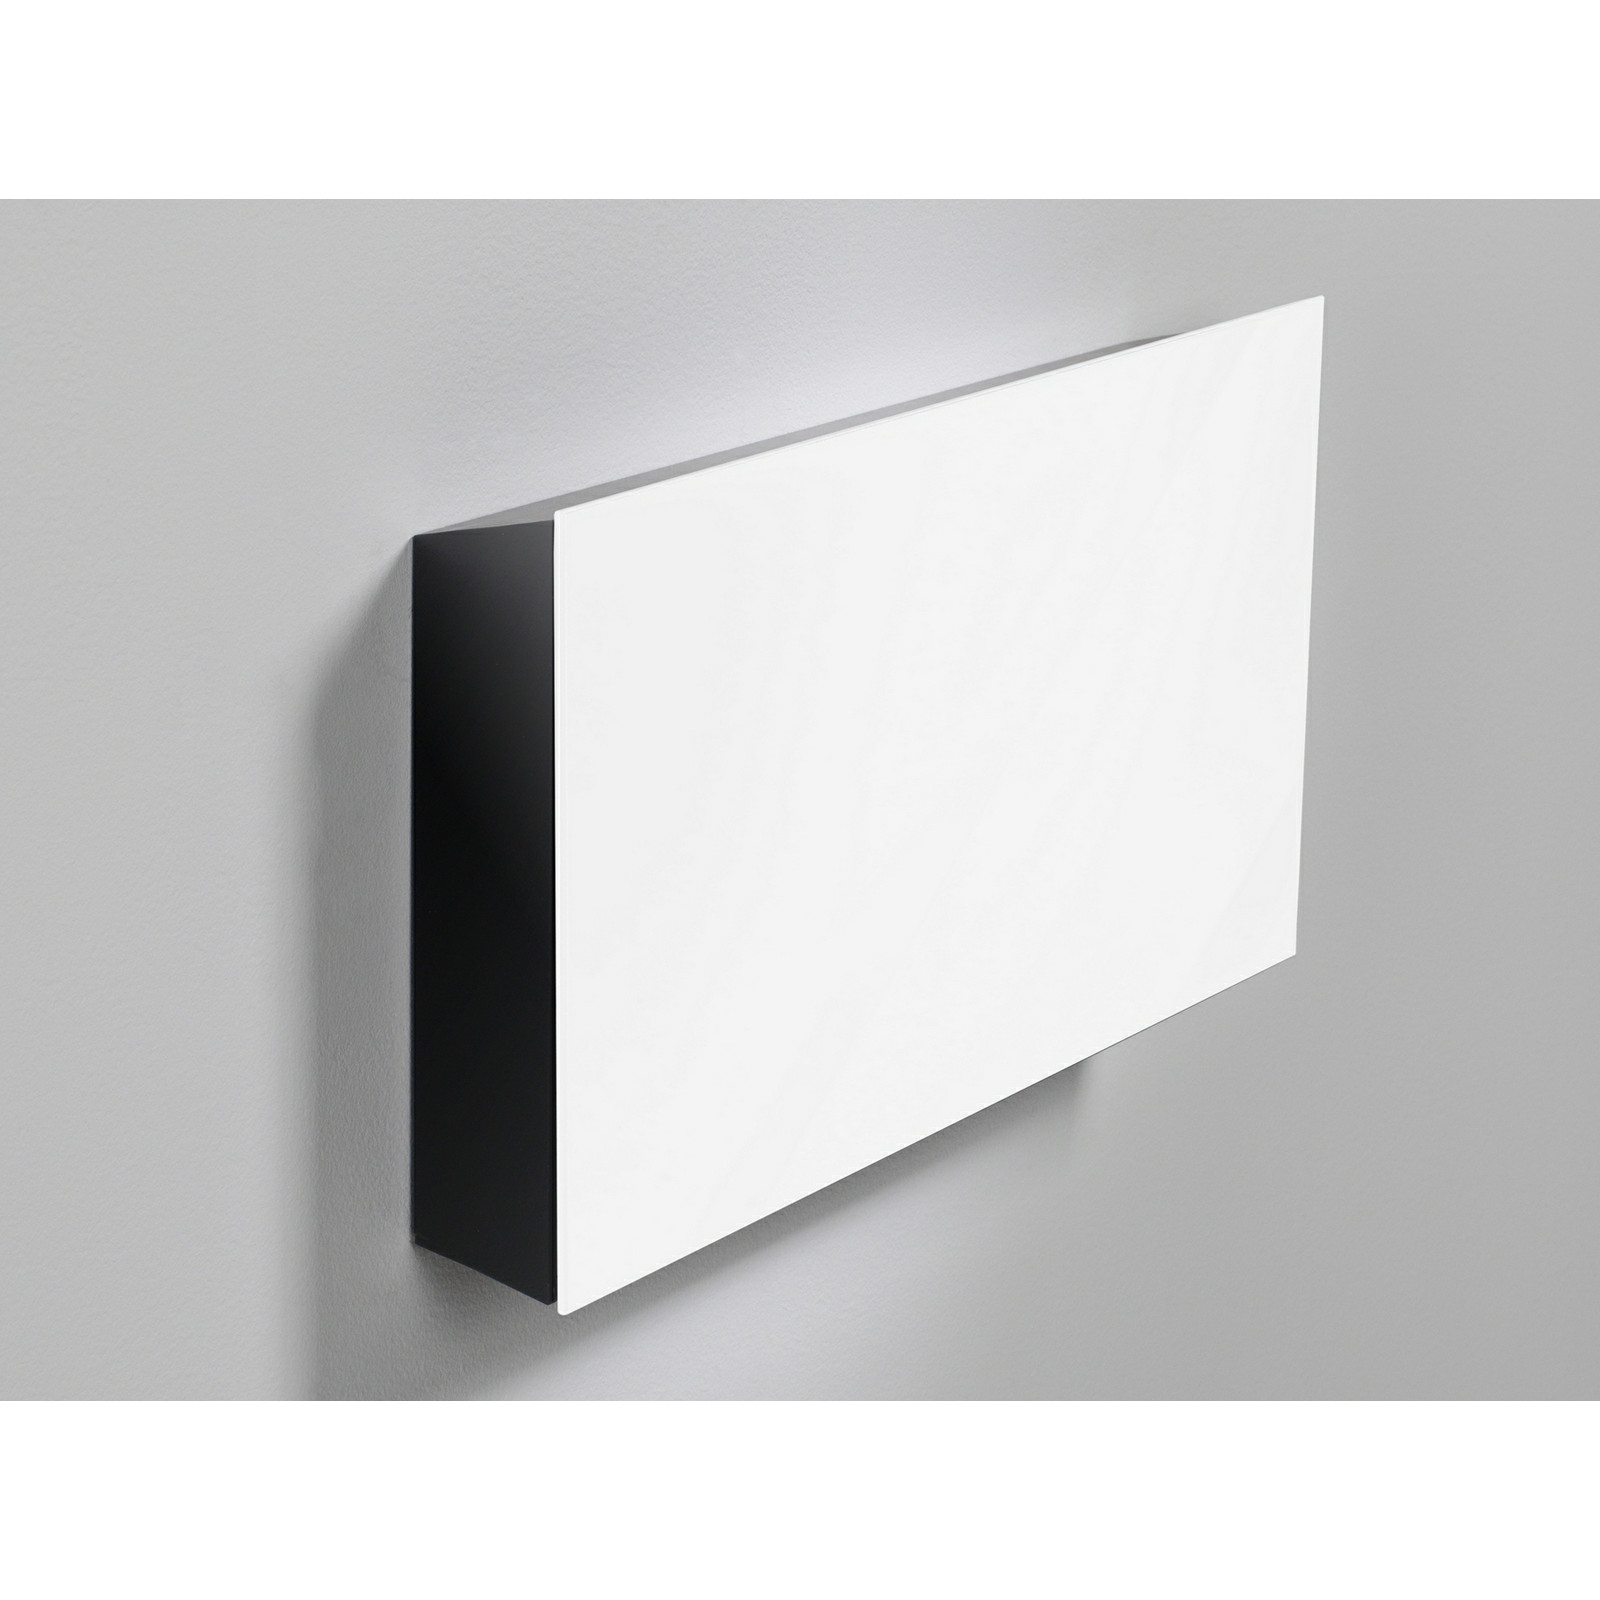 Lintex M Box, sort alukorpus m/hvid glasfront, 410x220x66mm